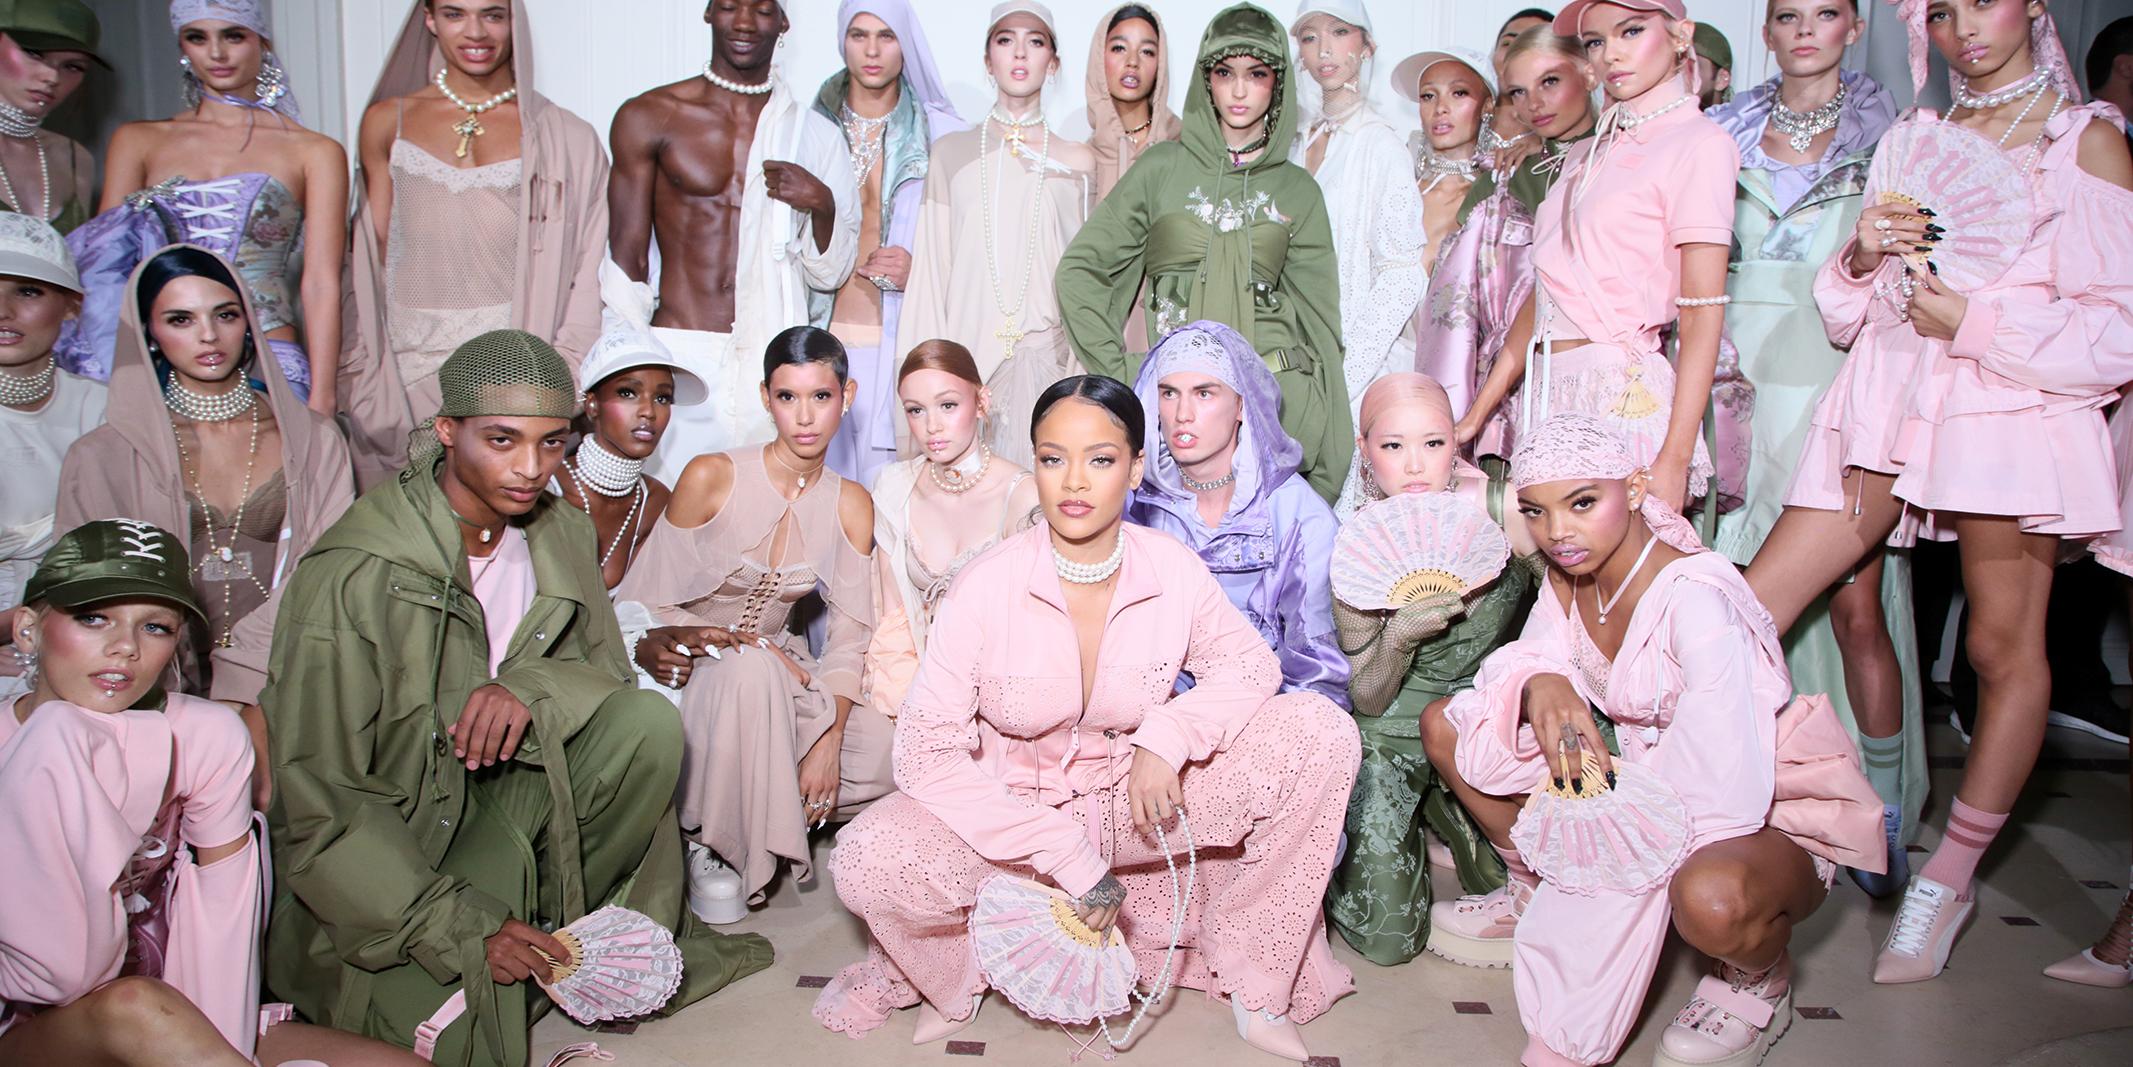 Inválido oscuro Travieso  Fenty Puma | Street Style by Rihanna at Life Style Sports